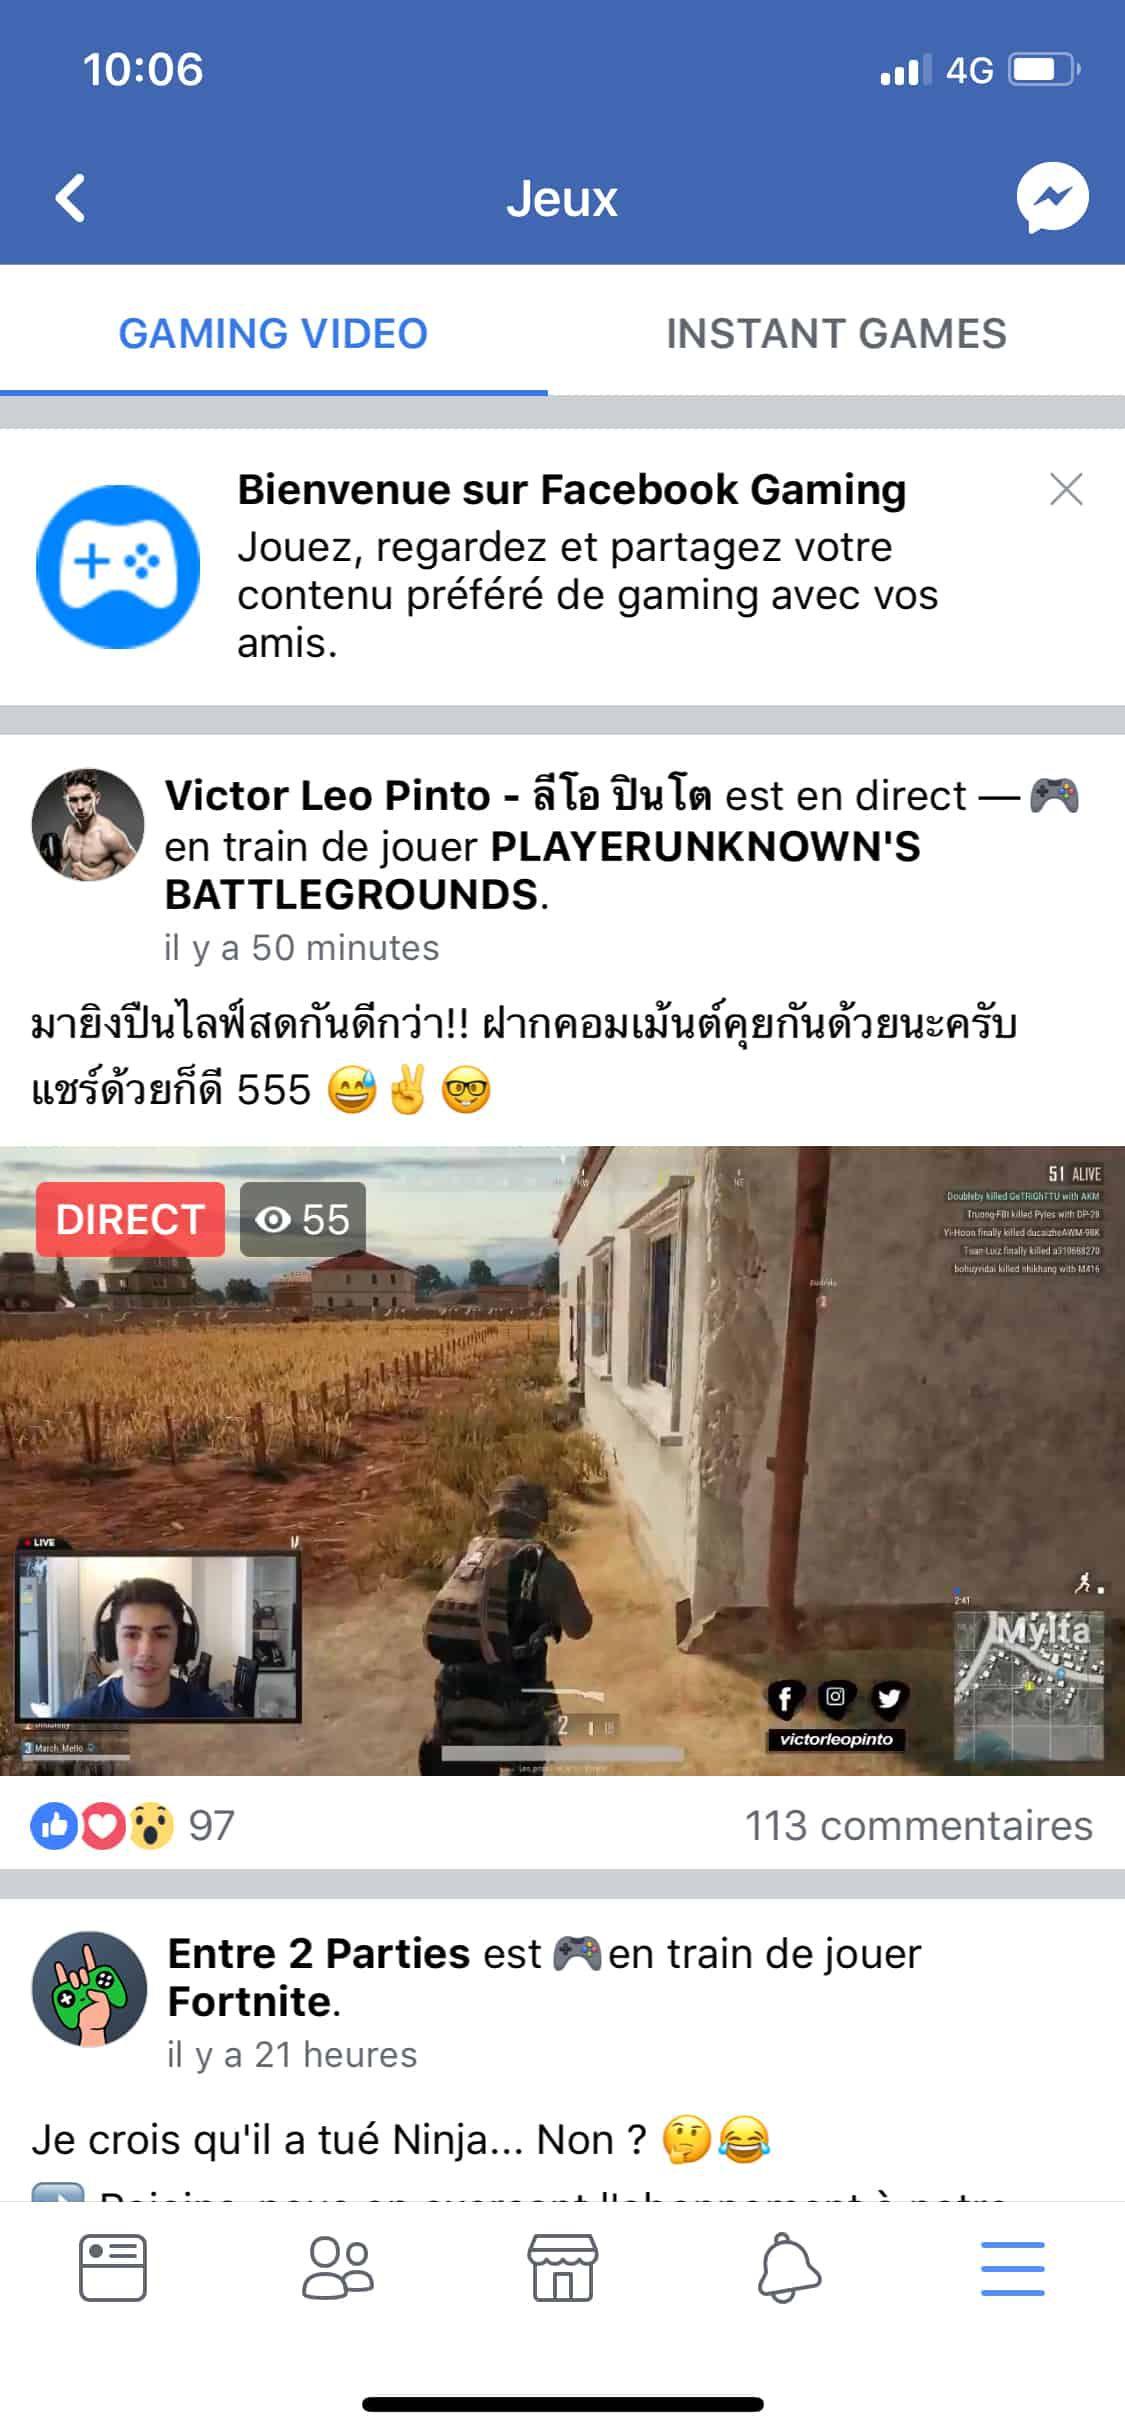 facebook gaming : fb.gg sur iOS